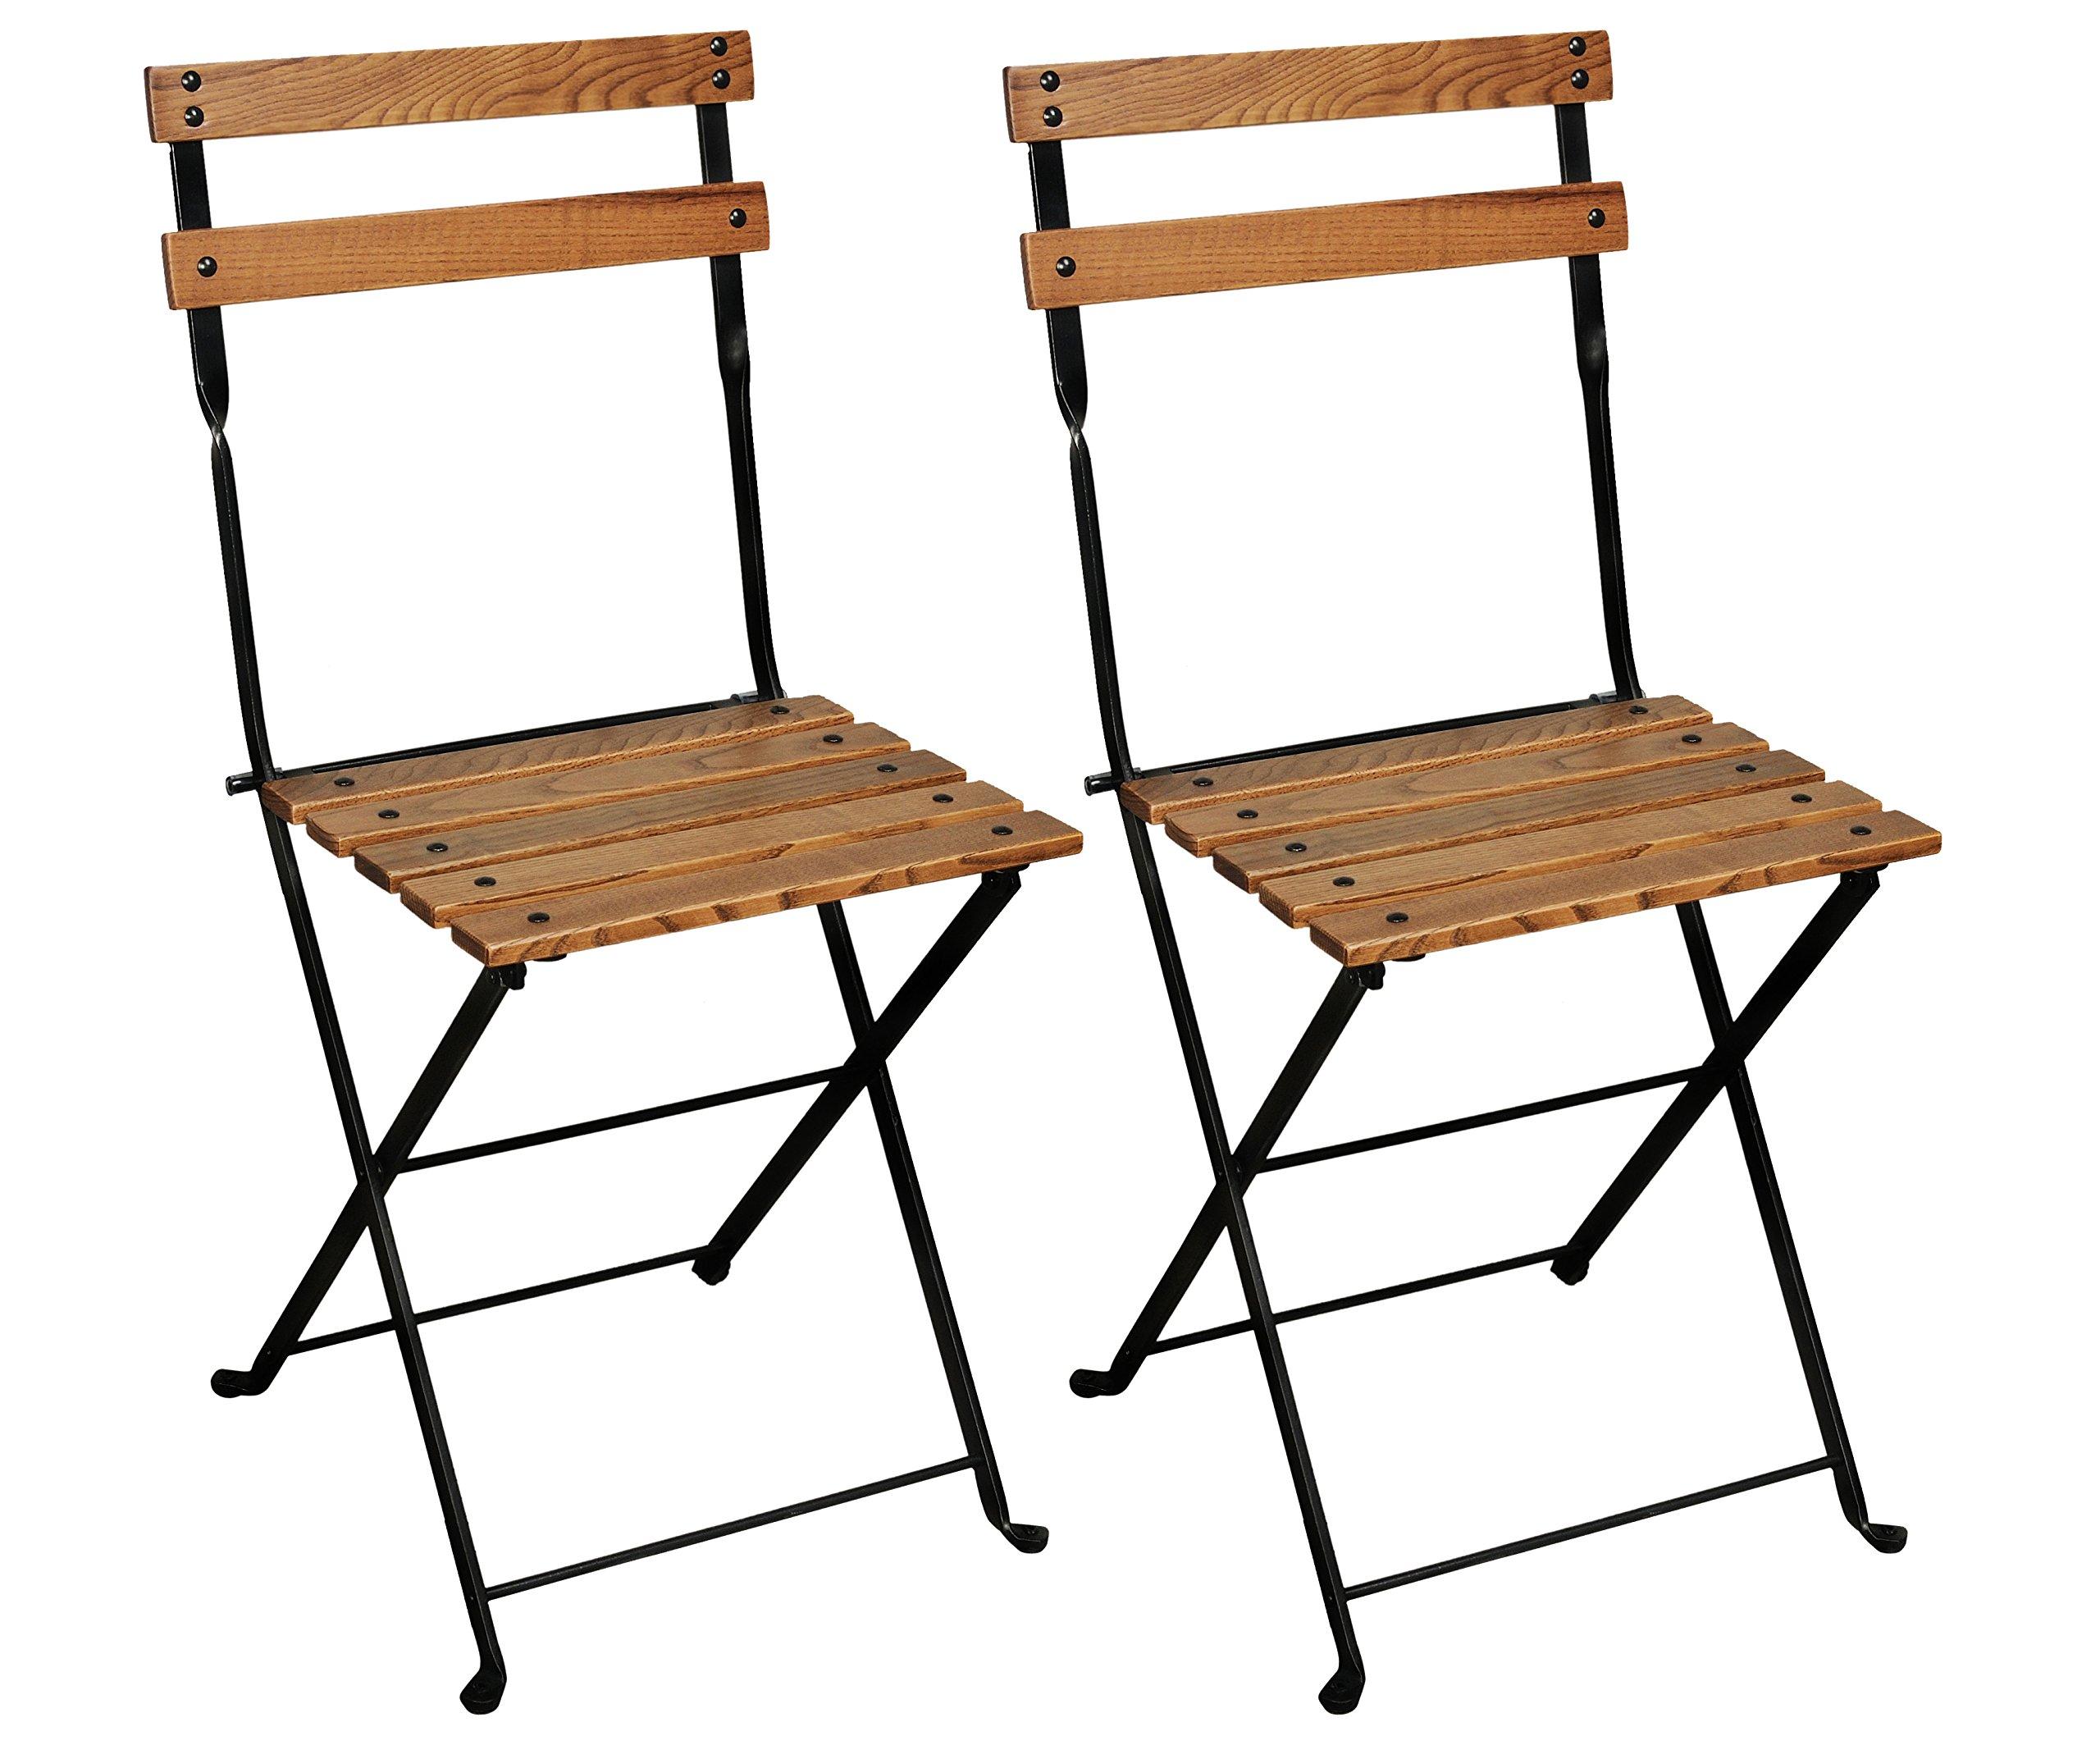 Mobel Designhaus French Café Bistro Folding Side Chair, Jet Black Frame, European Chestnut Wood Slats with Walnut Stain (Pack of 2)